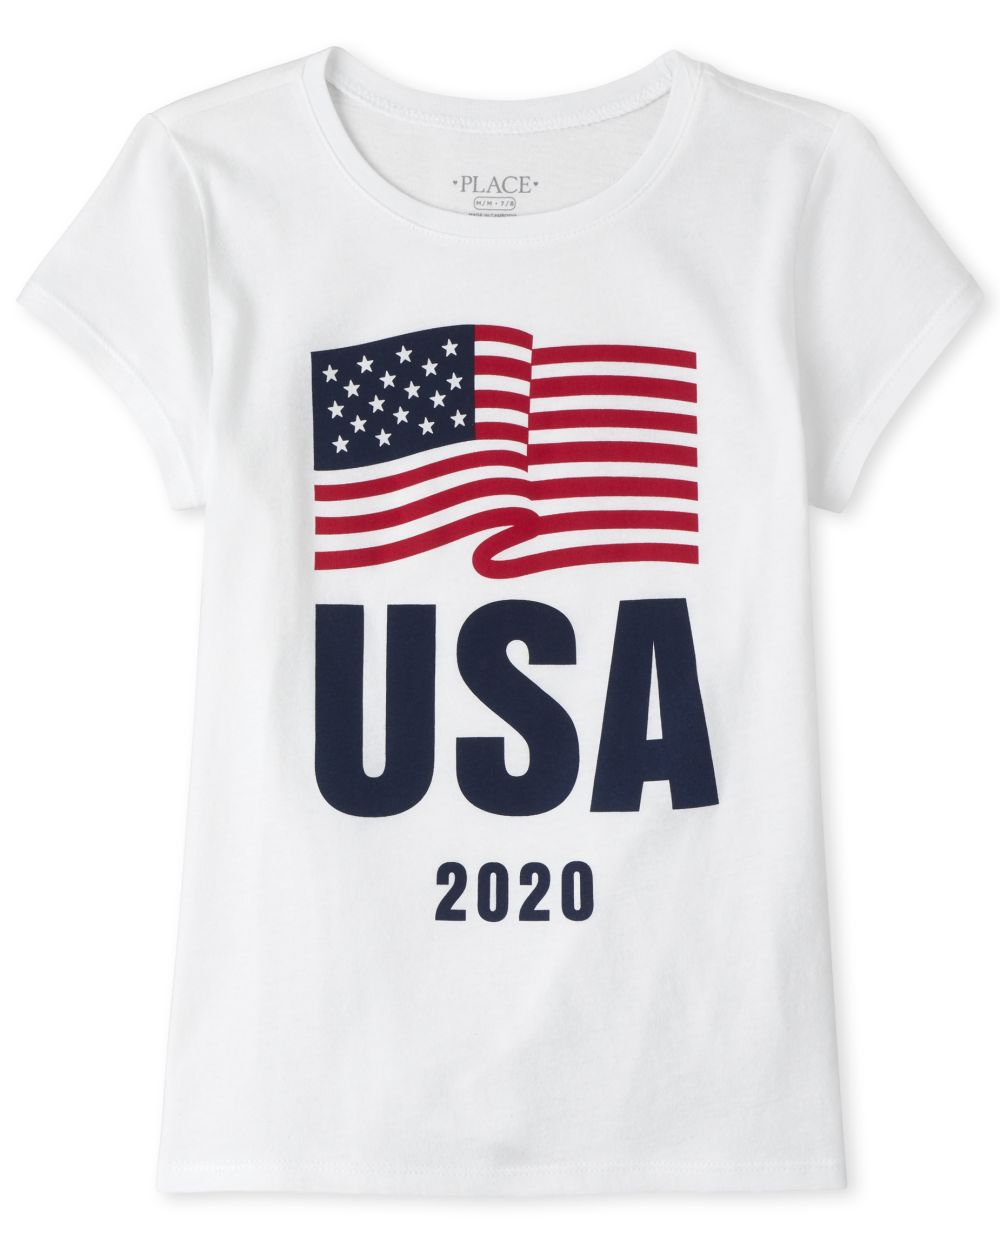 Matching Family Usa Olympics Graphic Tee - White T-Shirt